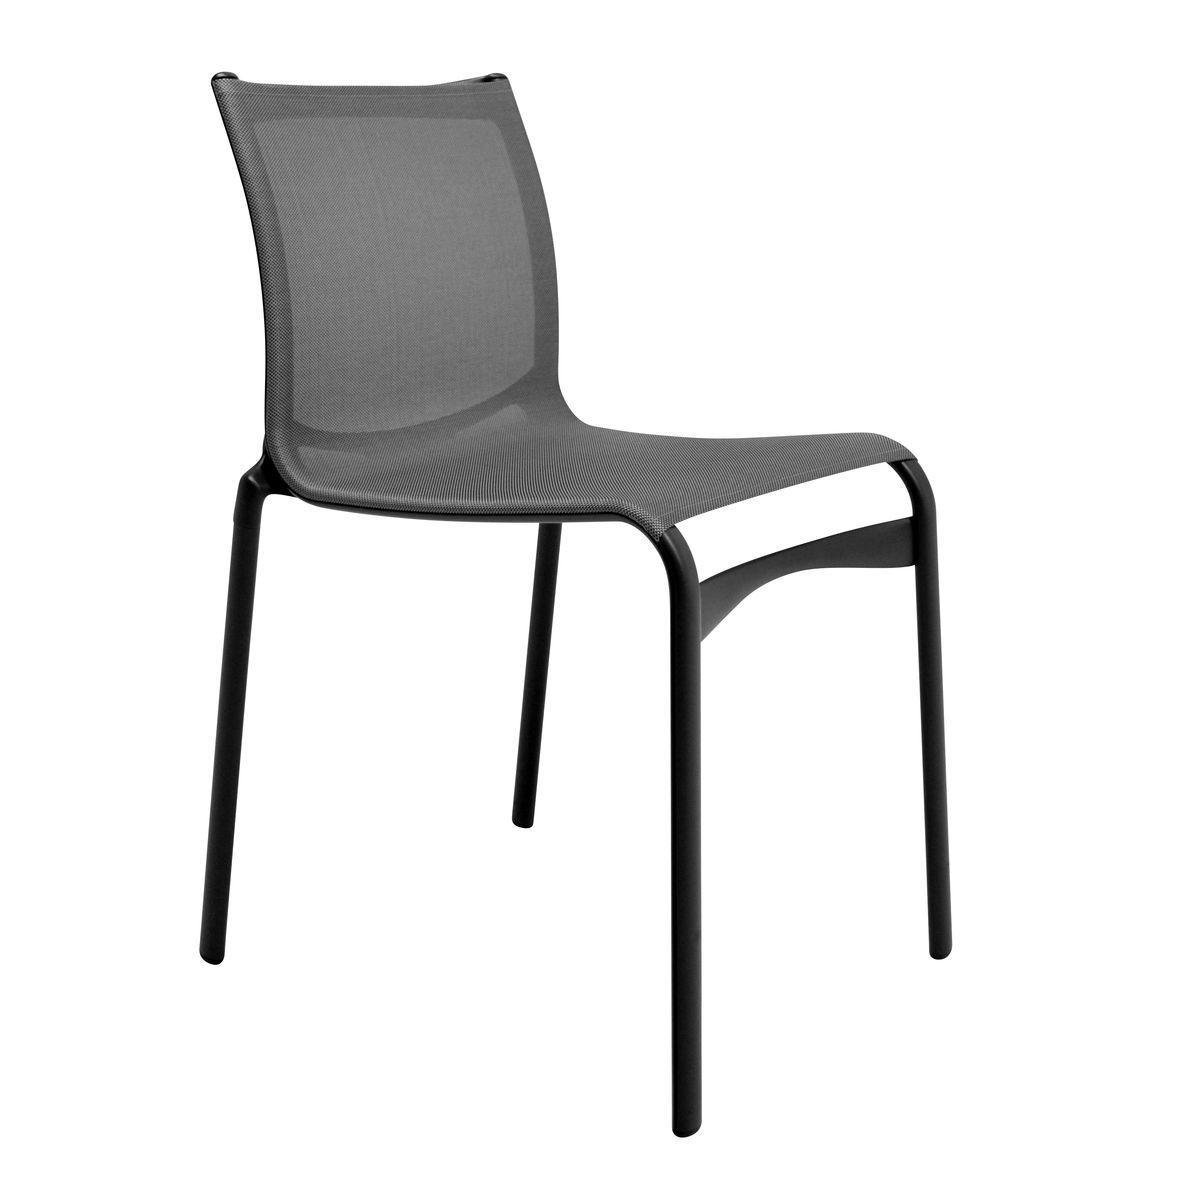 stuhl panton knoll international bertoia stuhl von harry bertoia 1952 designermbel von smow de. Black Bedroom Furniture Sets. Home Design Ideas